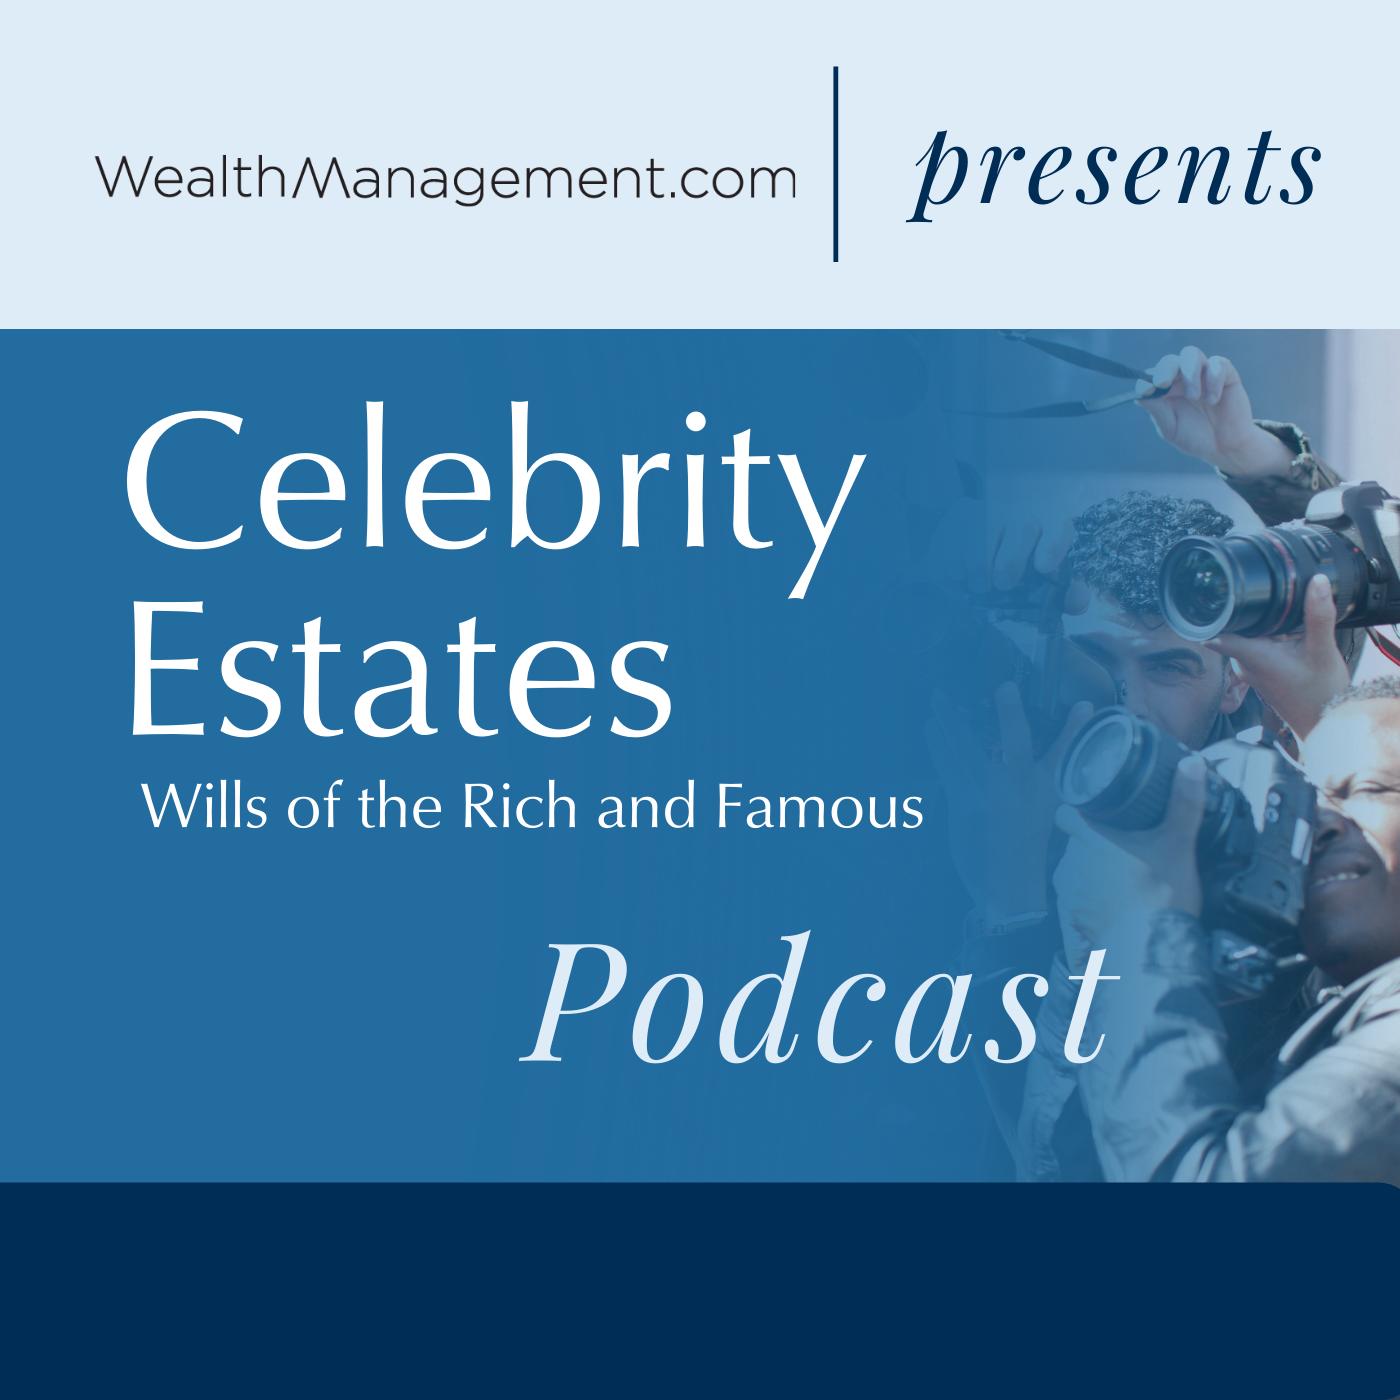 Celebrity Estates